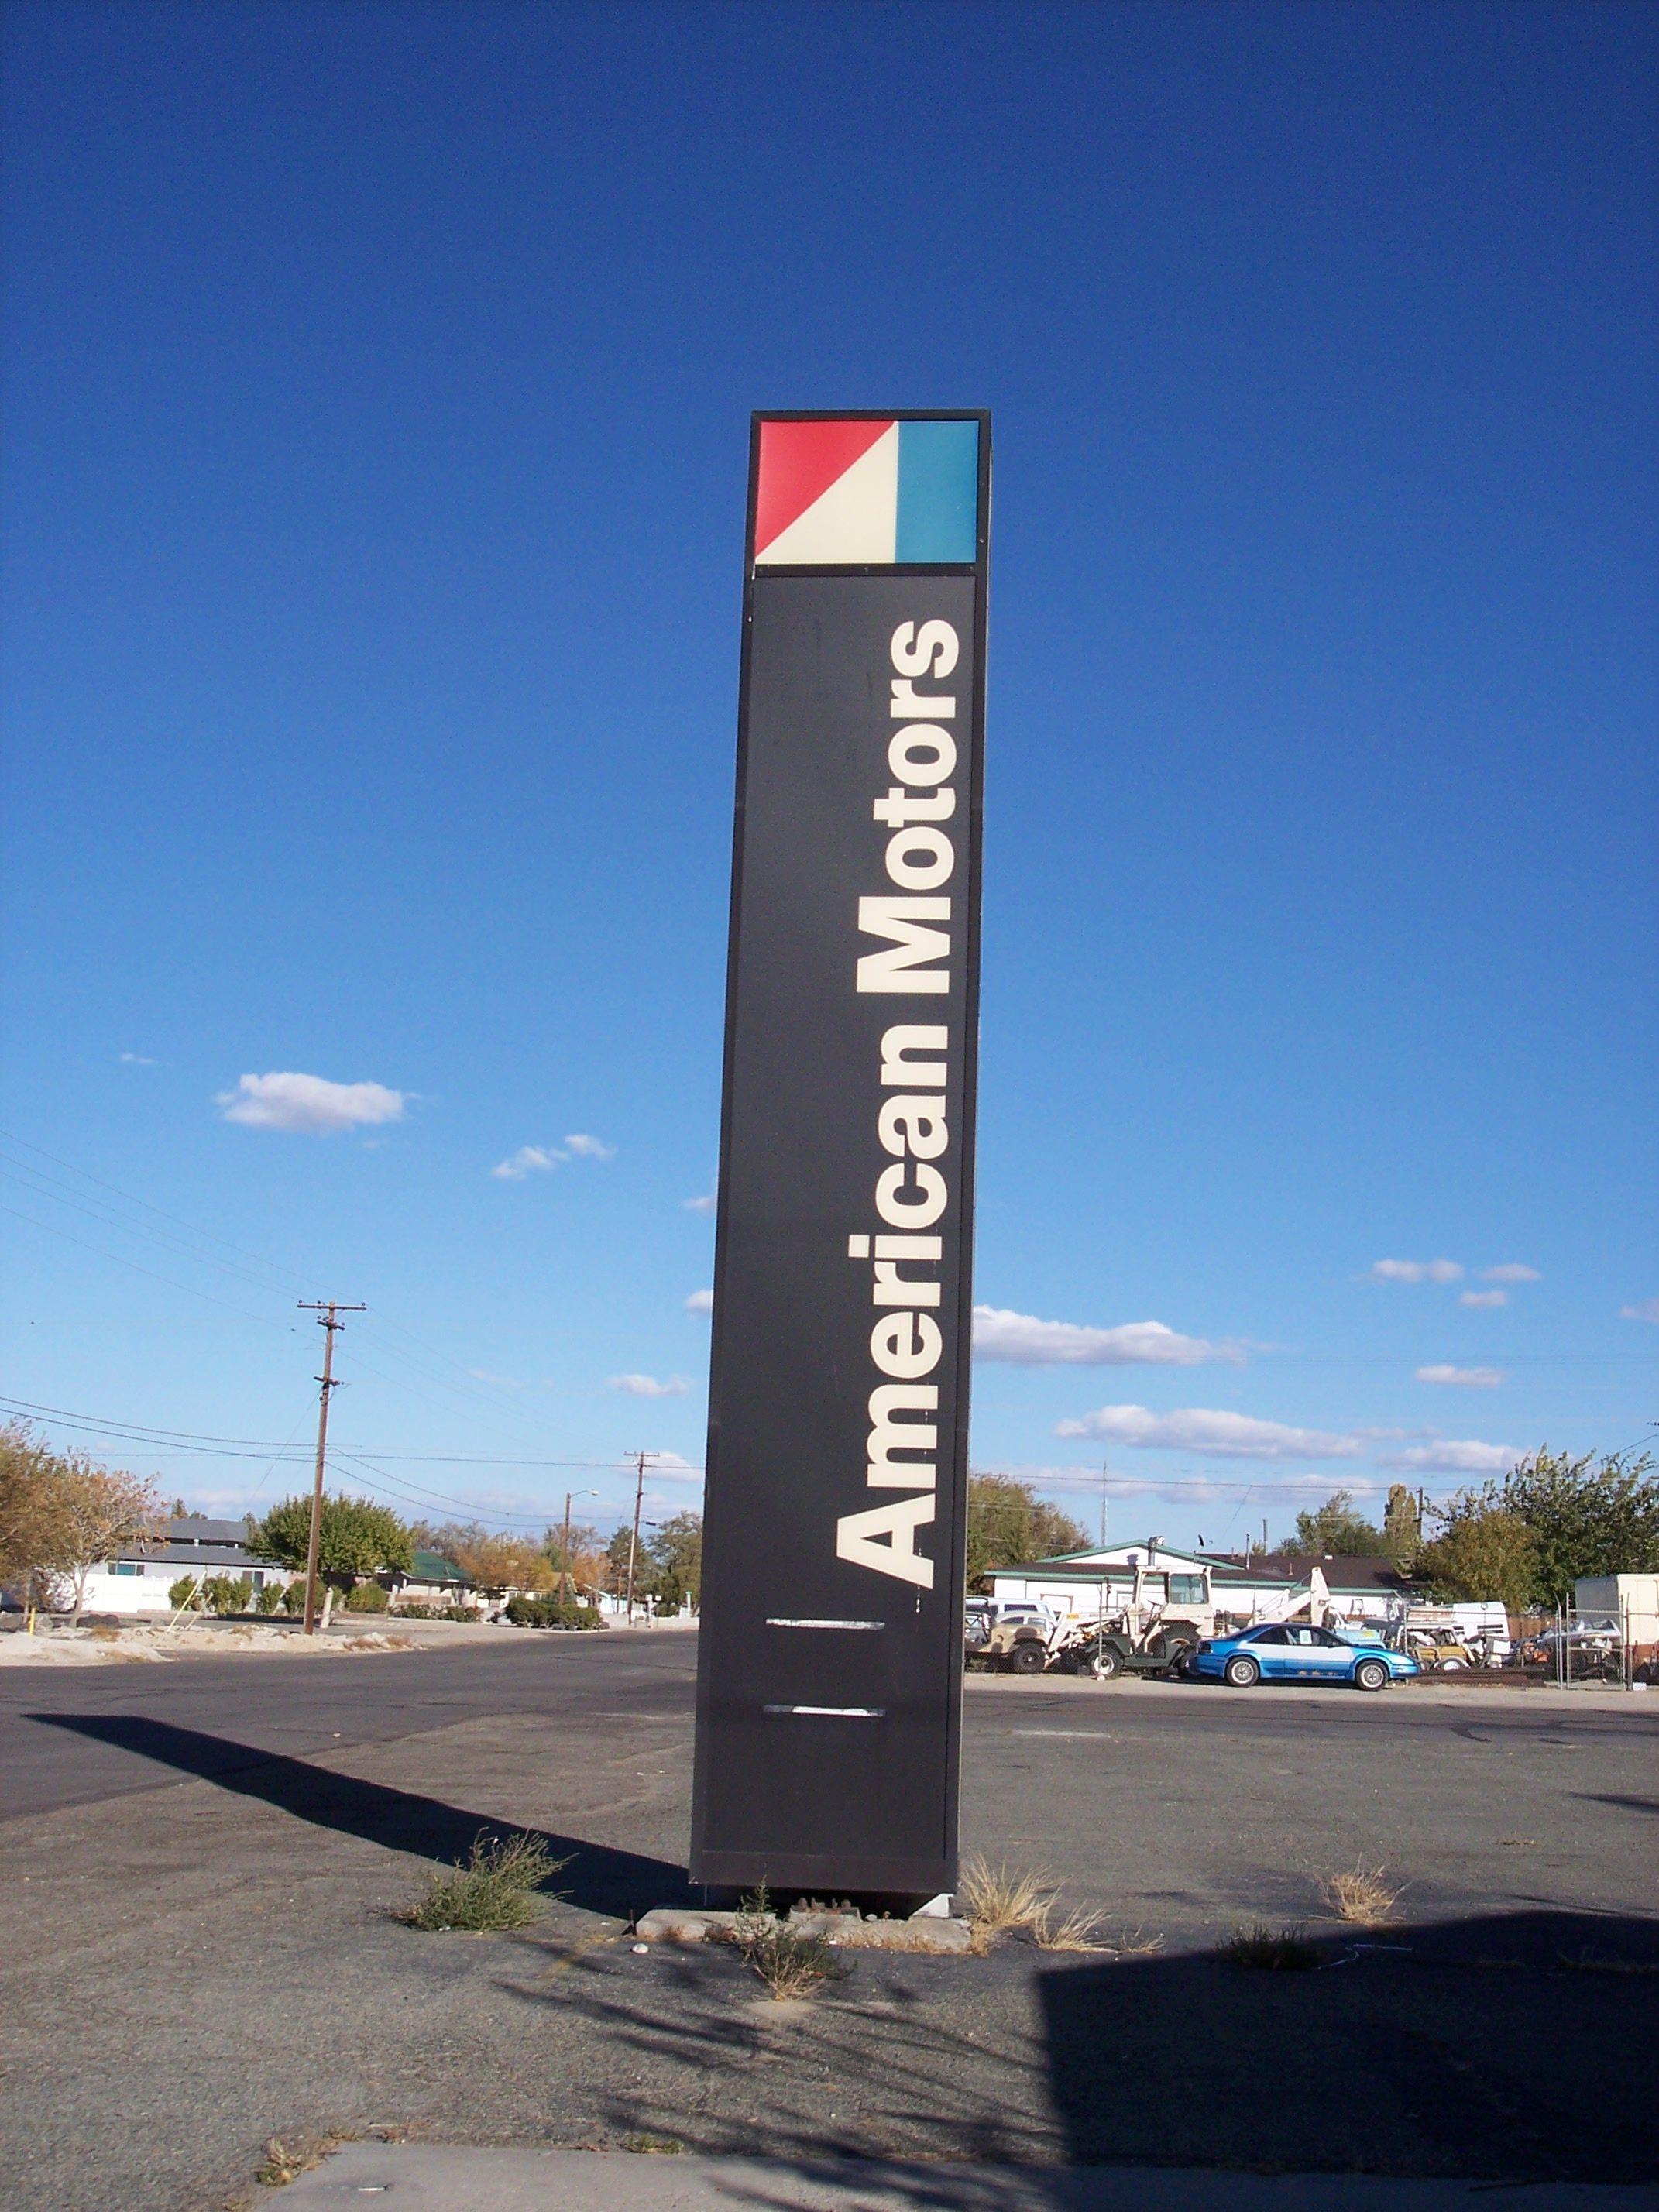 Amc Dealer Sign American Motors Car Dealership Hudson Hornet